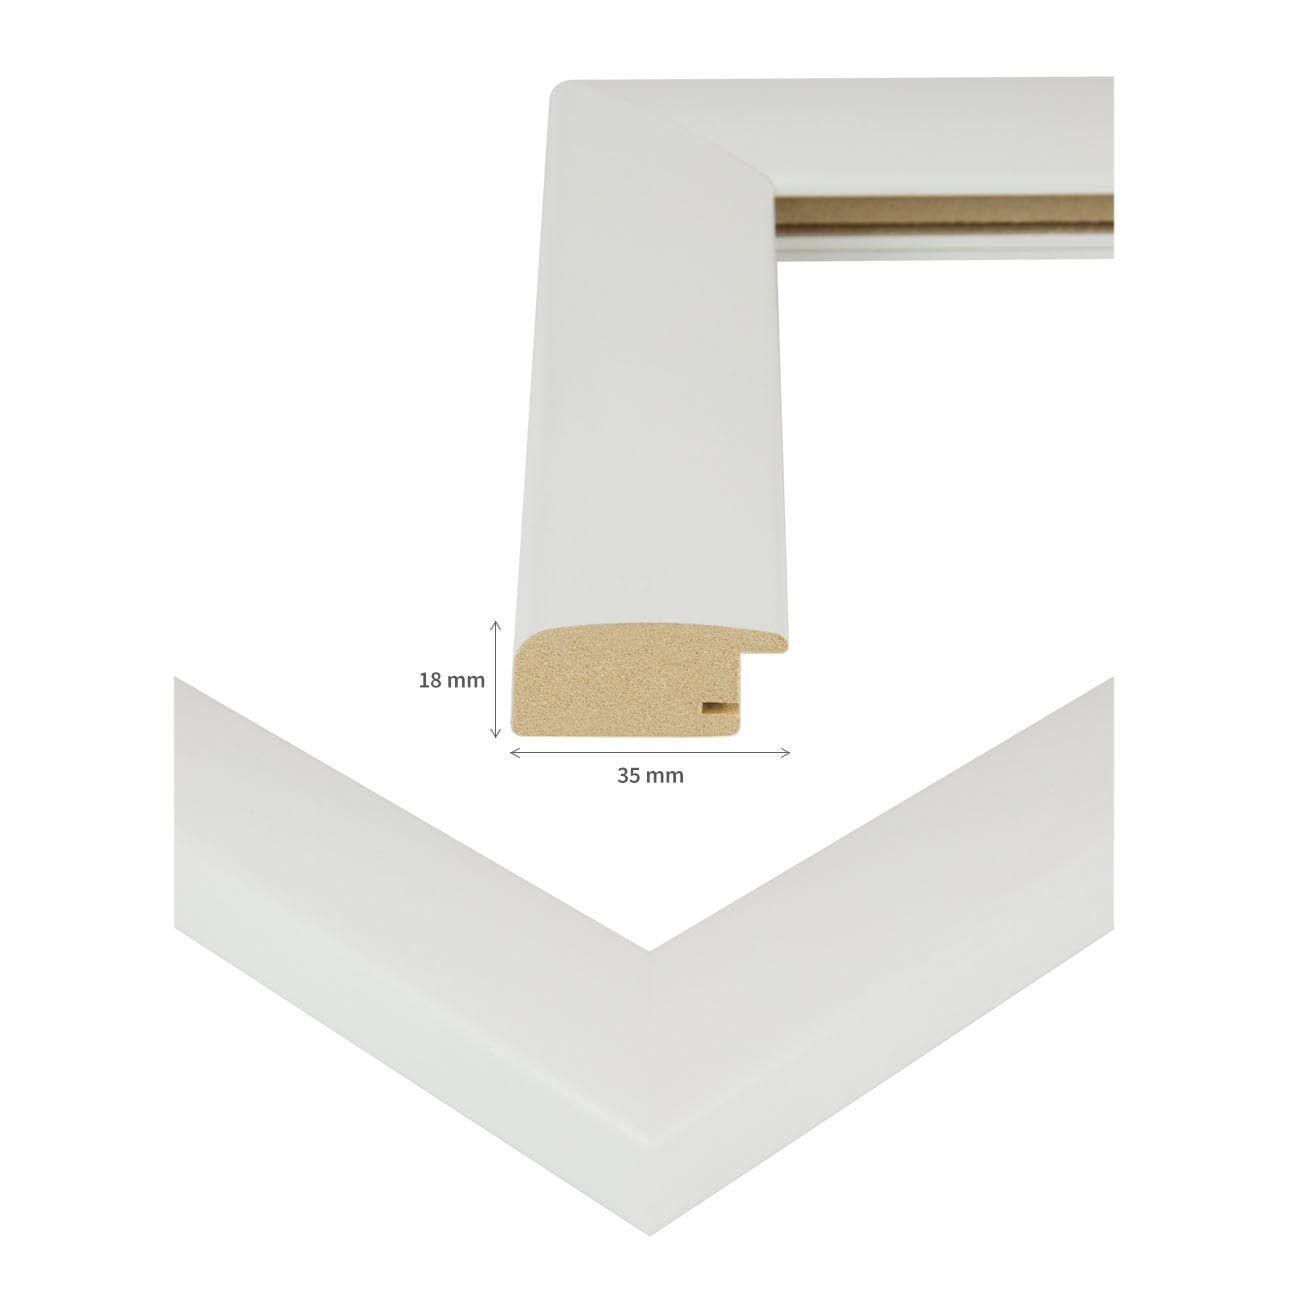 Bilderrahmen Holz Rahmen 50x70 50x75 DIN A1 A0 60x80 60x90 61x91 70x100 80x120 Weiß